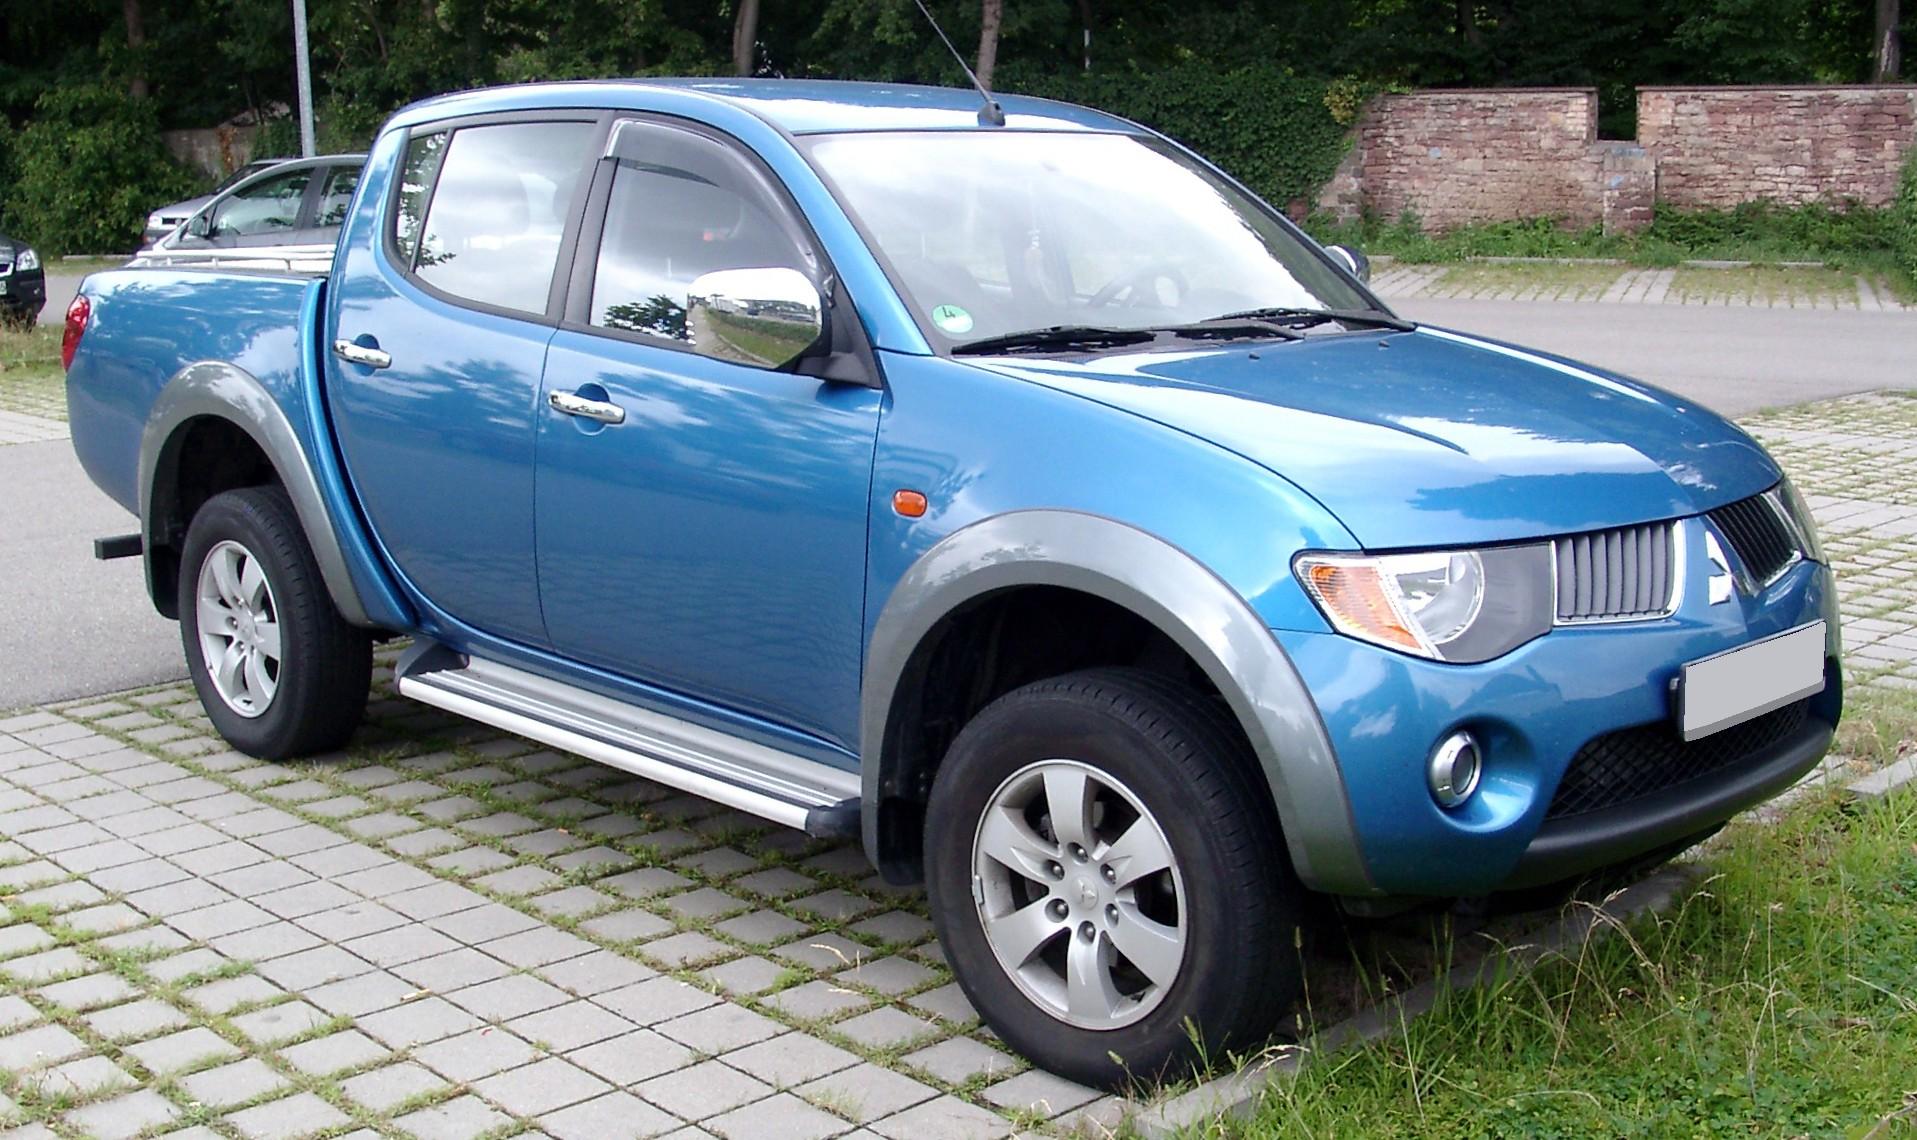 File:Mitsubishi L200 front 20080722.jpg